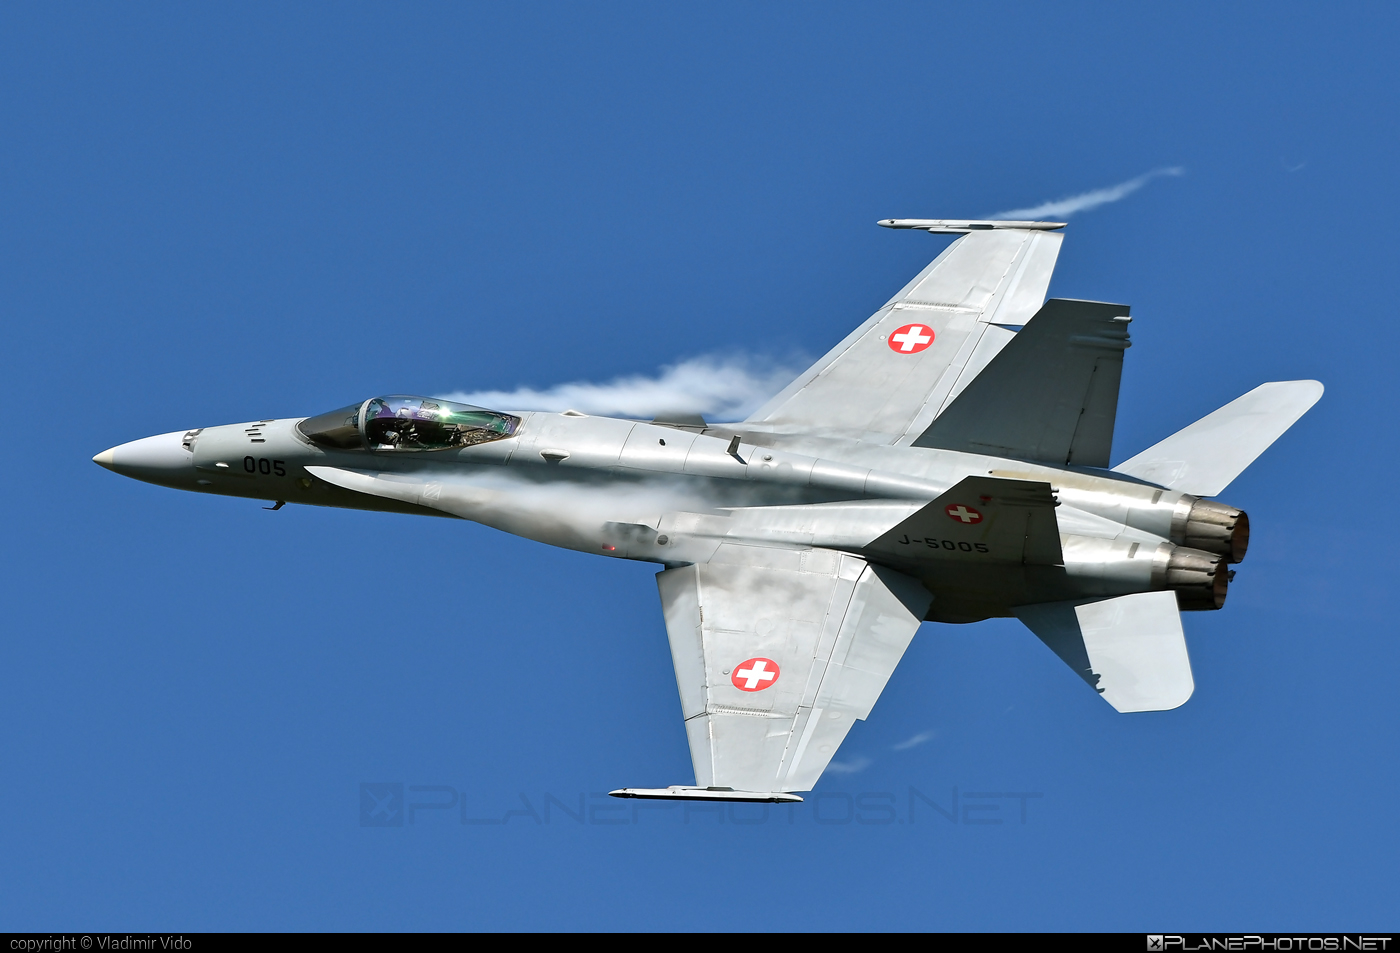 McDonnell Douglas F/A-18C Hornet - J-5005 operated by Schweizer Luftwaffe (Swiss Air Force) #f18 #f18hornet #fa18 #fa18c #fa18hornet #mcdonnelldouglas